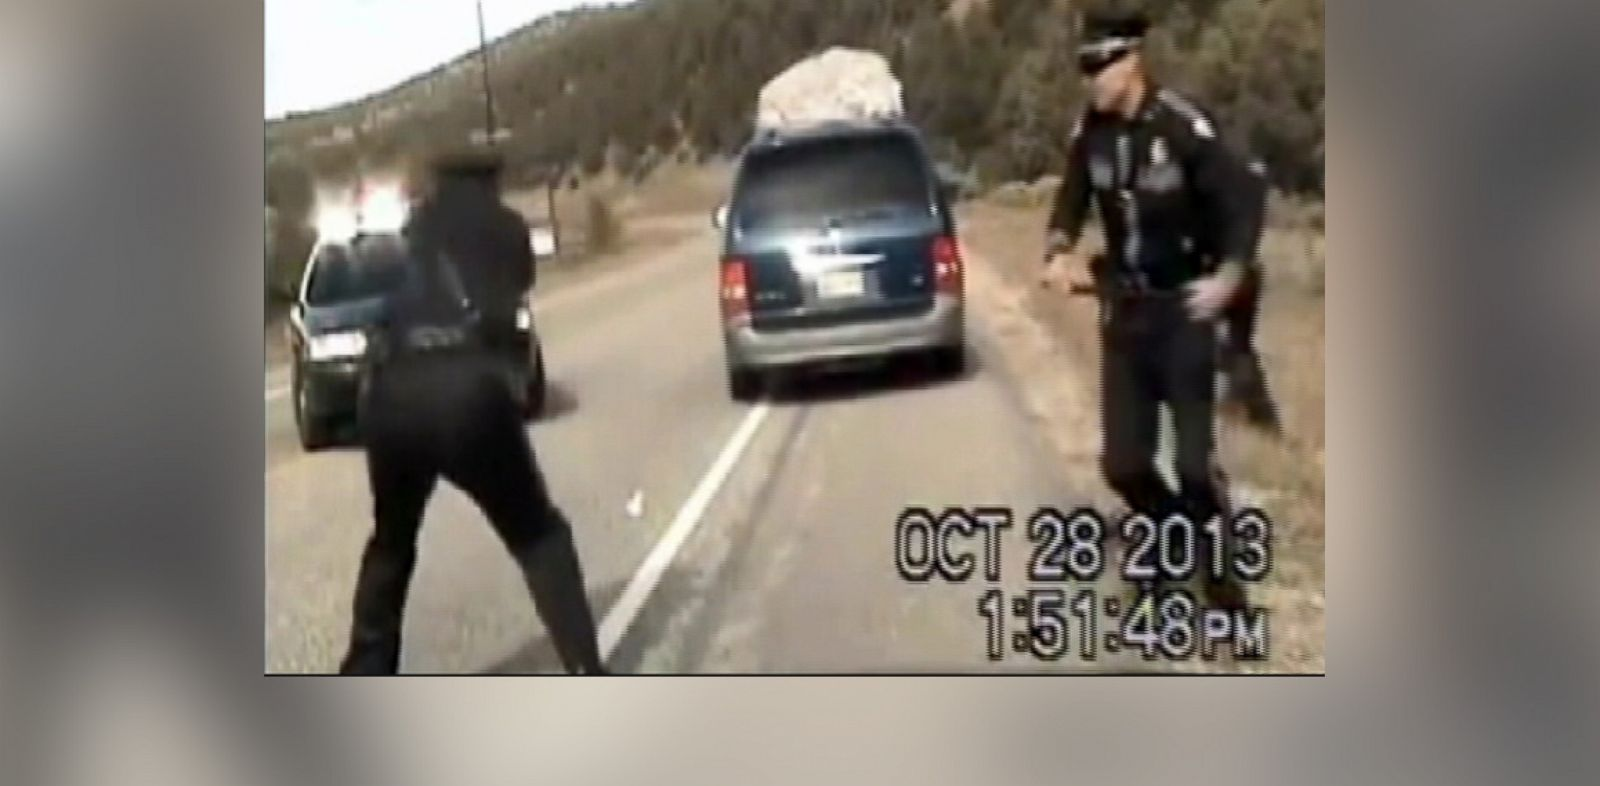 PHOTO: A police cruiser dashboard camera shows Elias Montoya firing shots at a minivan, Oct. 28, 2013.